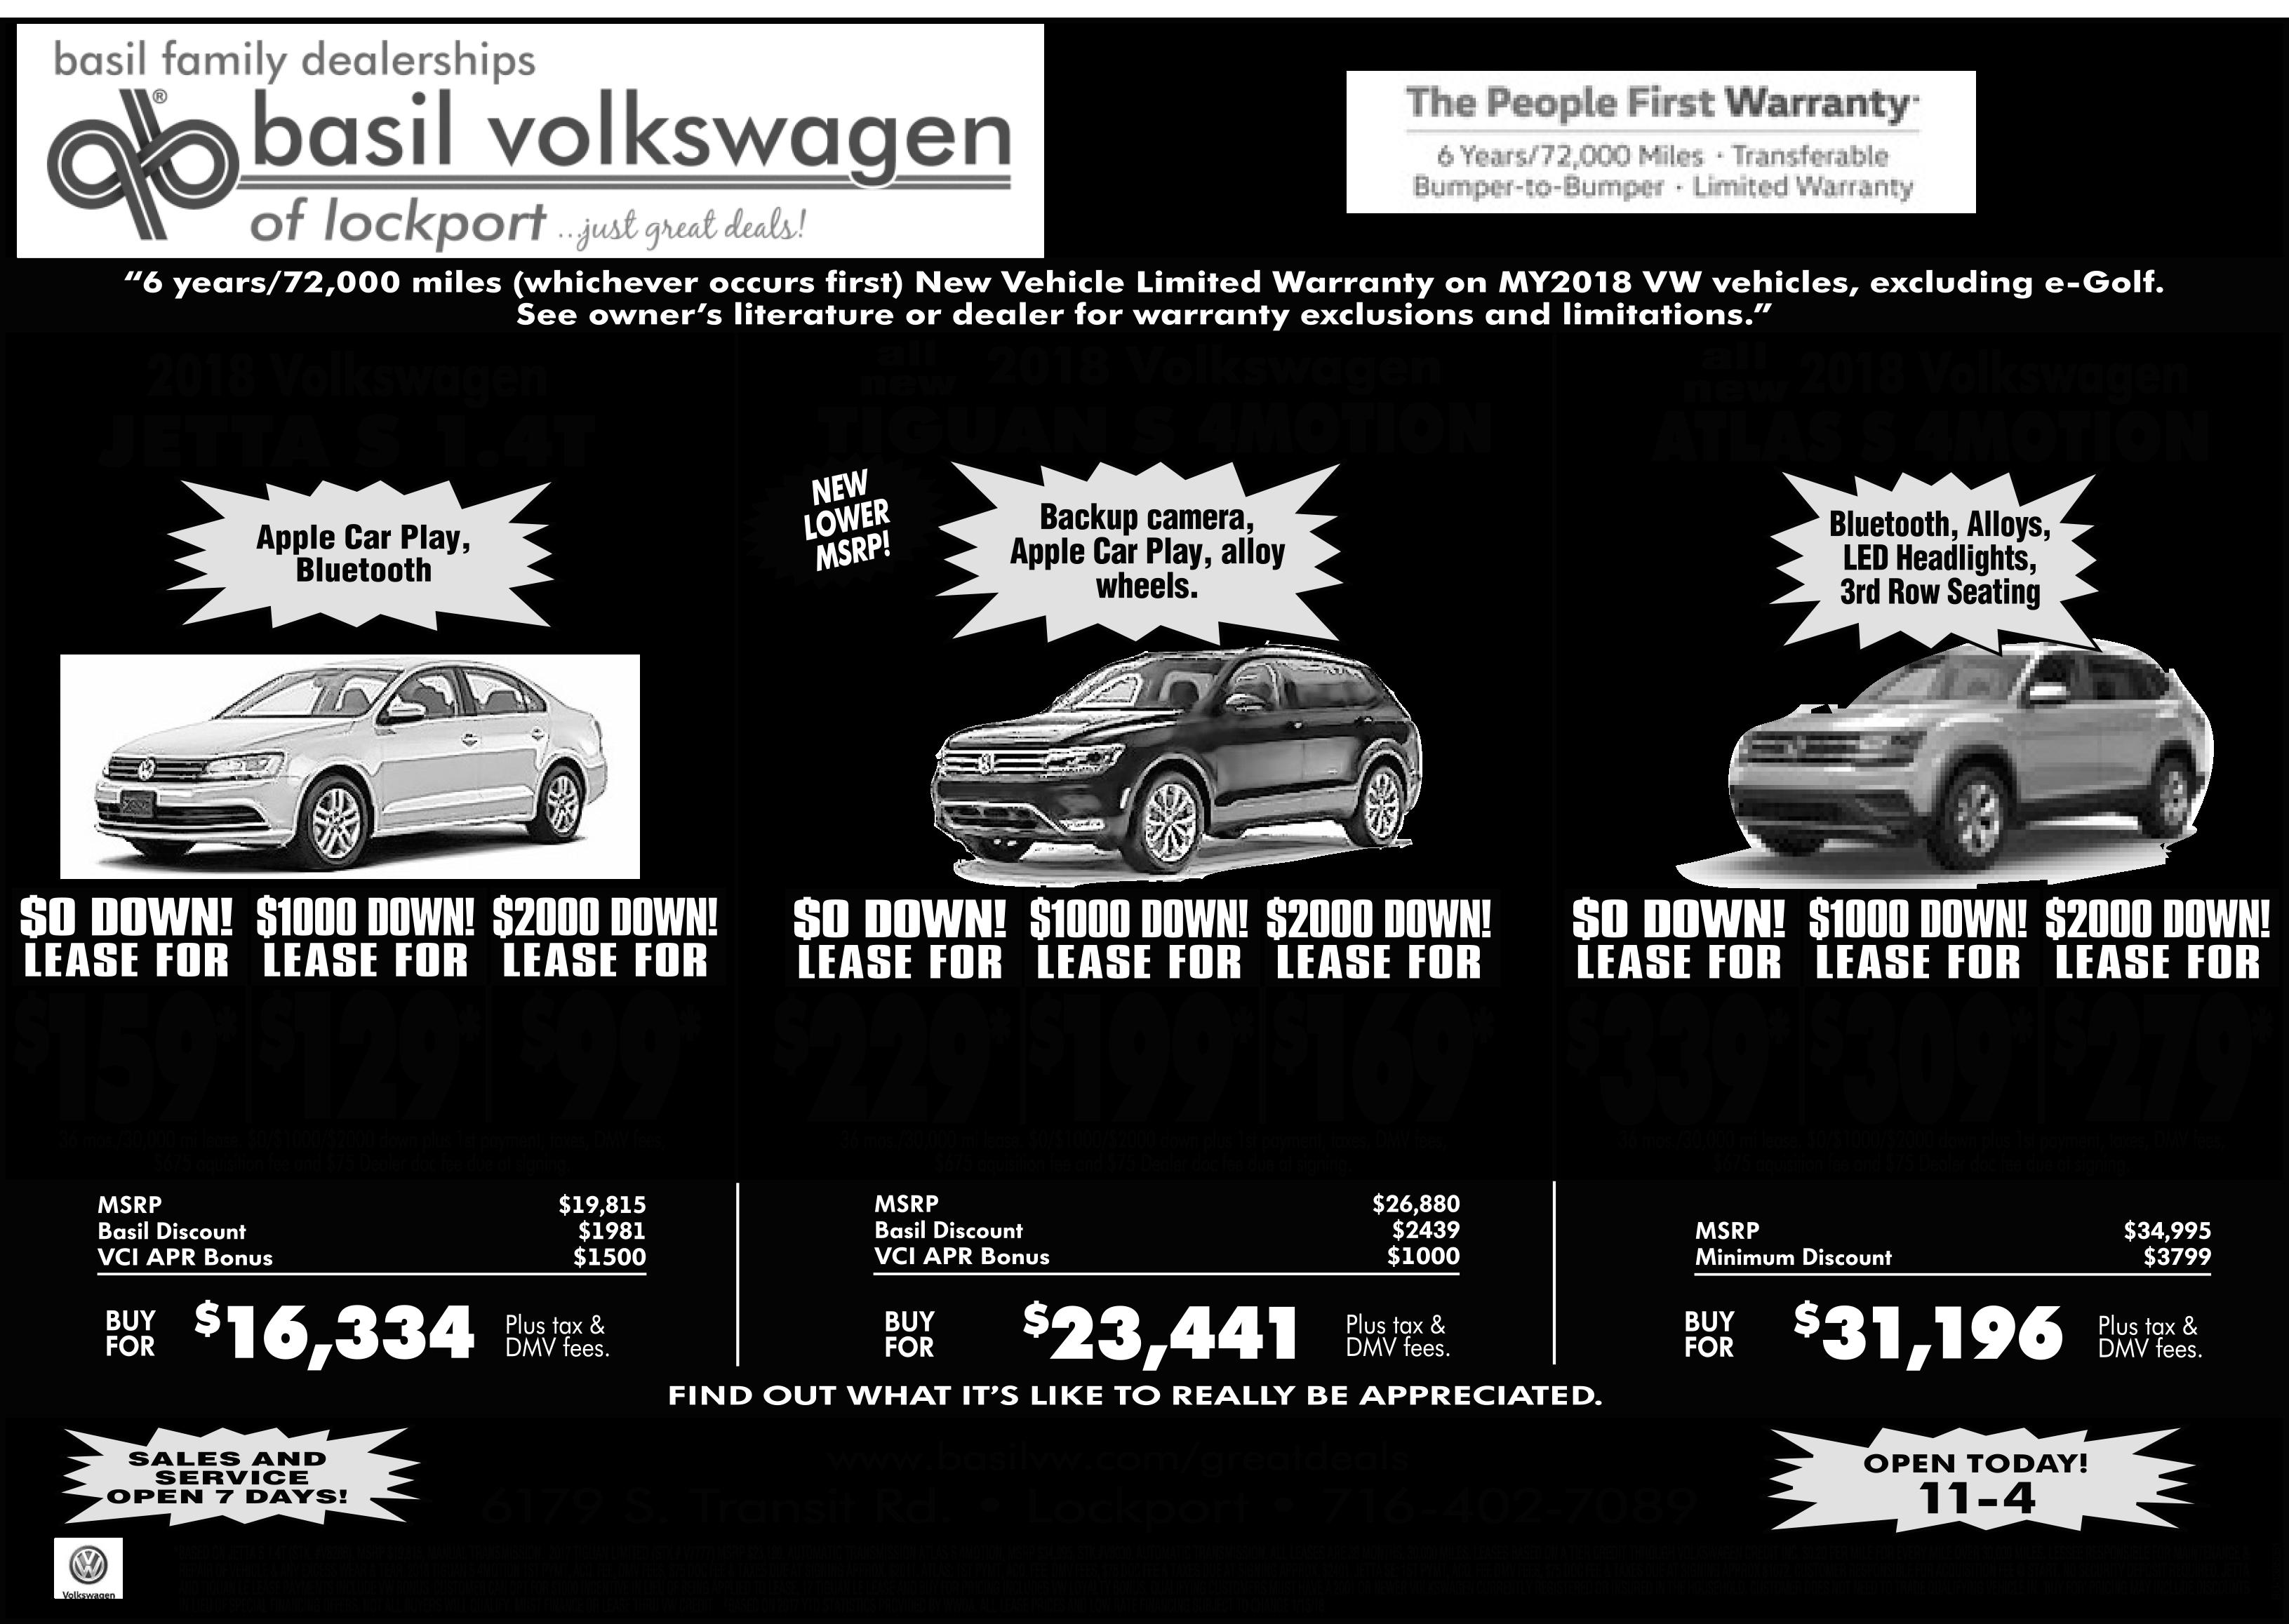 volkswagen featuring dealer parts watch passat lamborghini youtube vw and bbs